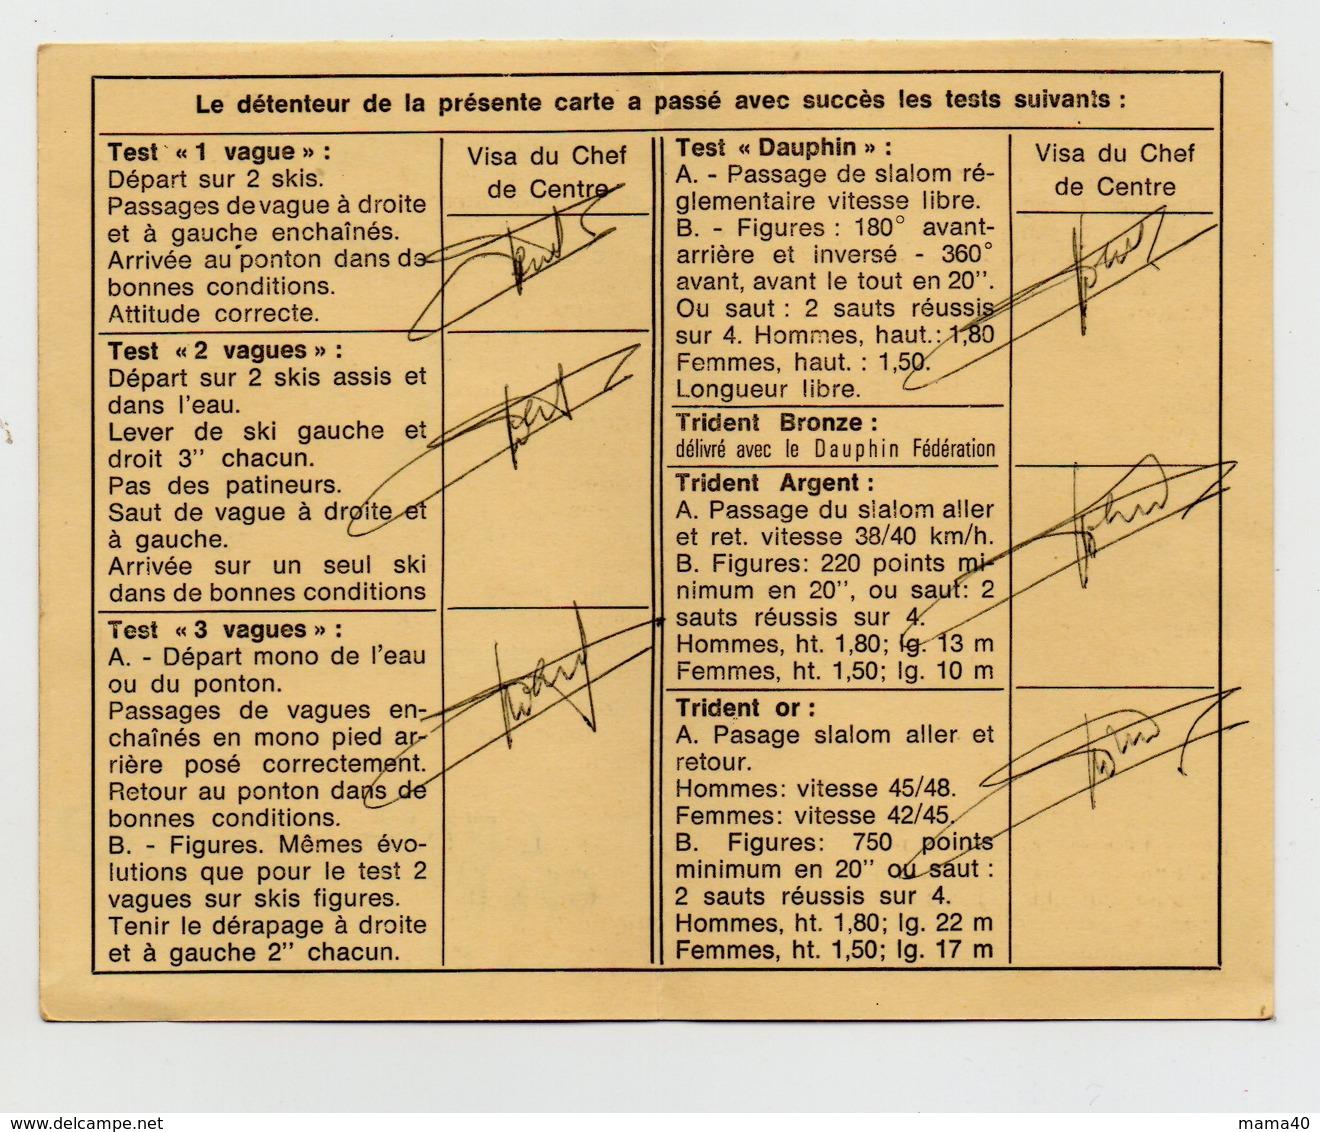 CARTE NOMINATIVE - CLUB MEDITERRANEE - SPORT -  SKI NAUTIQUE - CARNET DE CLASSEMENT - Vieux Papiers